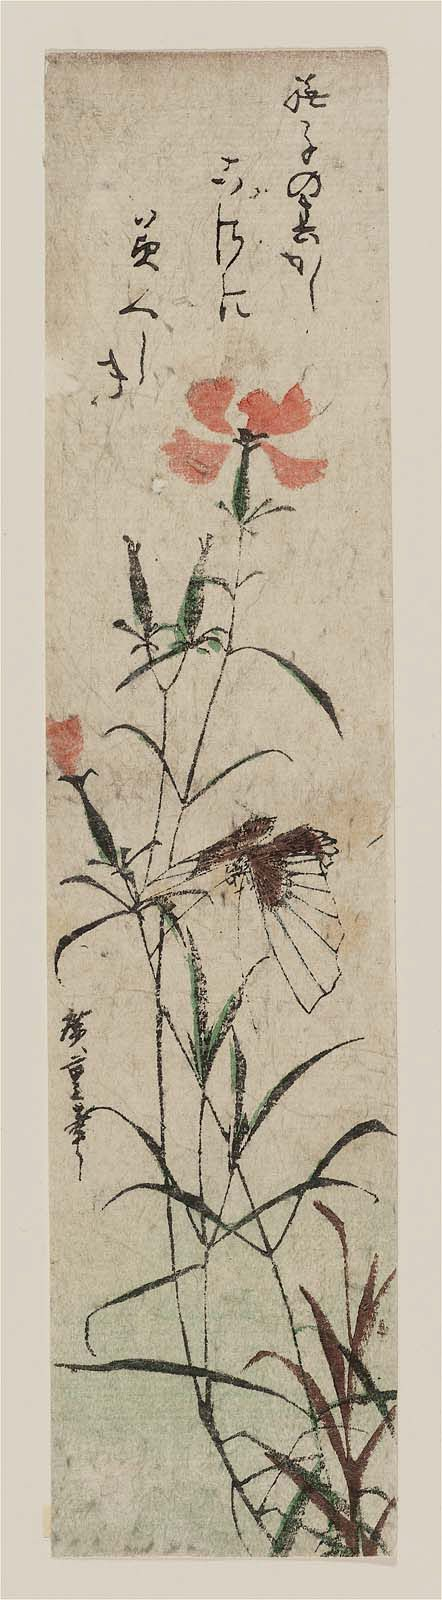 'Pinks and Butterfly.' Woodblock print by Utagawa Hiroshige I (Japanese, 1797–1858). Image and text courtesy MFA Boston. heaveninawildflower.tumblr.com